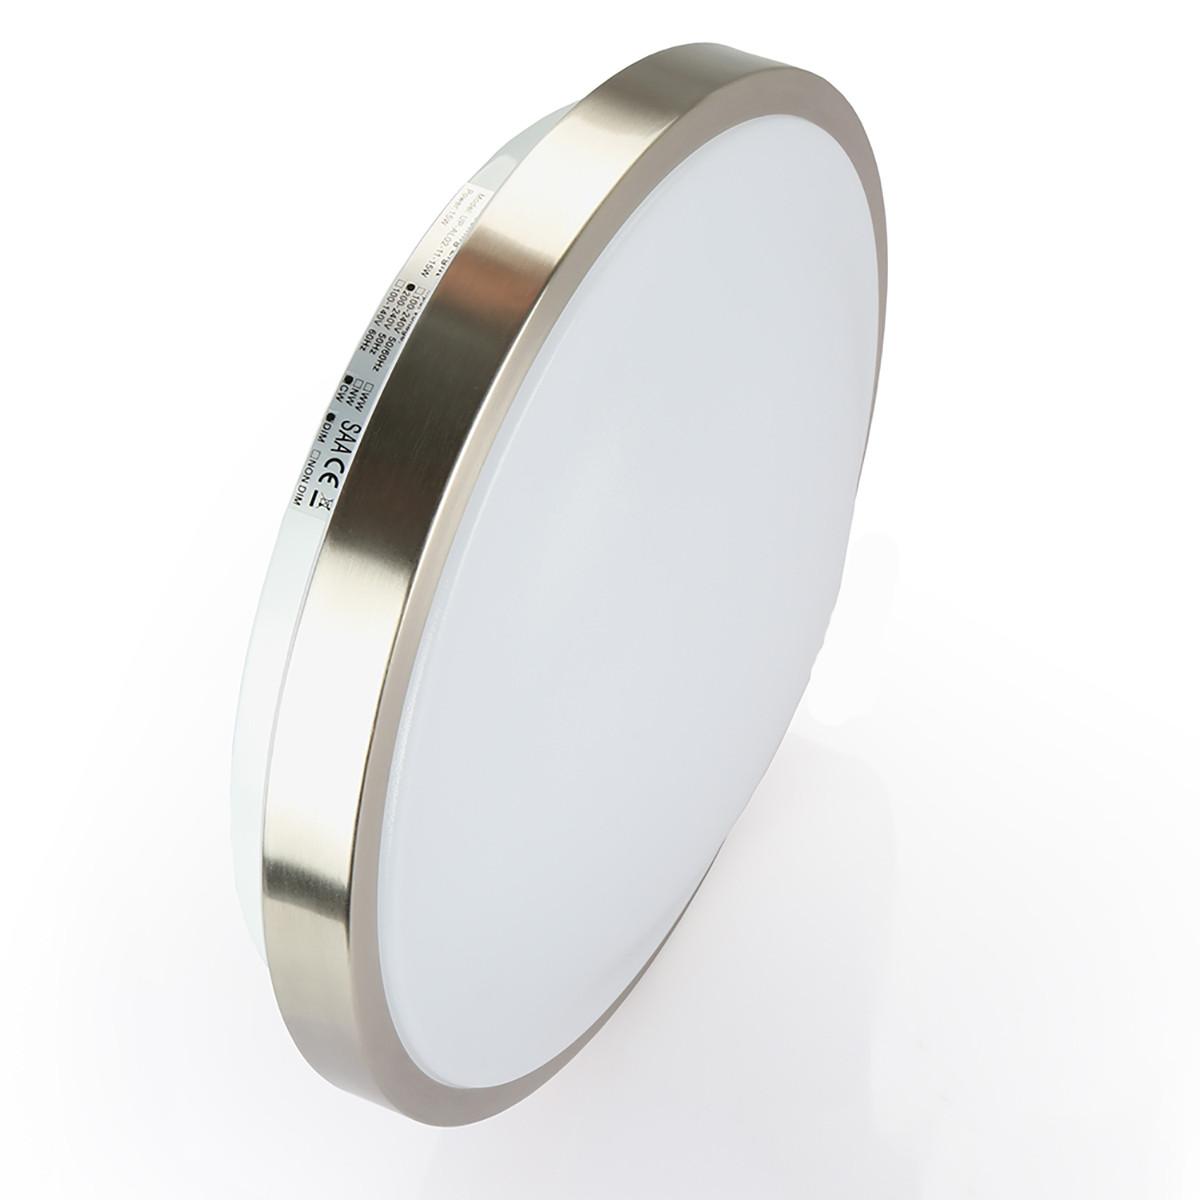 18W 13-Inch,3000K,4000K,6000K  Non-dimable Flush Mount Antique Brushed Nickel  LED Ceiling Light for Home Lighting